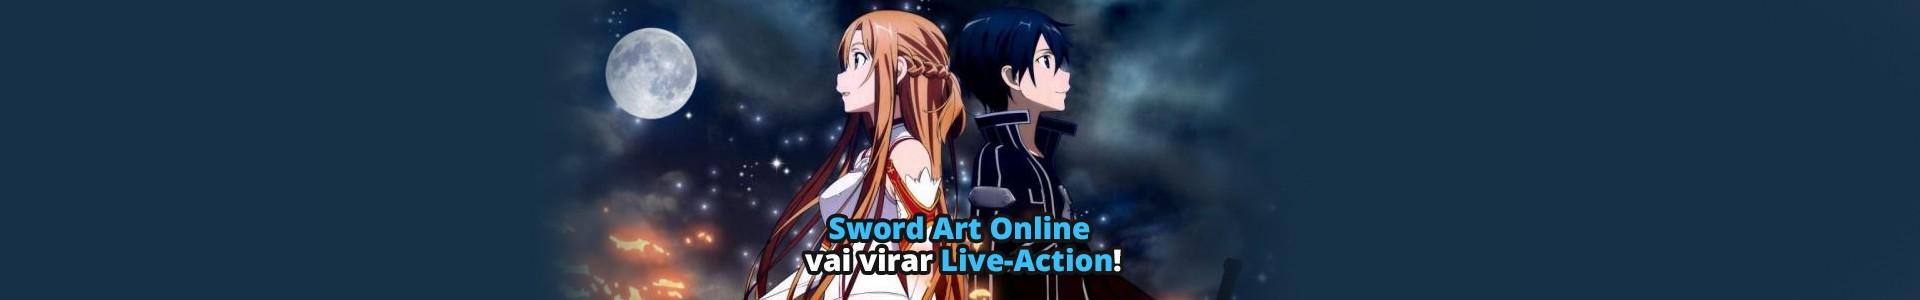 Sword Art Online vai virar série Live-Action pela Netflix